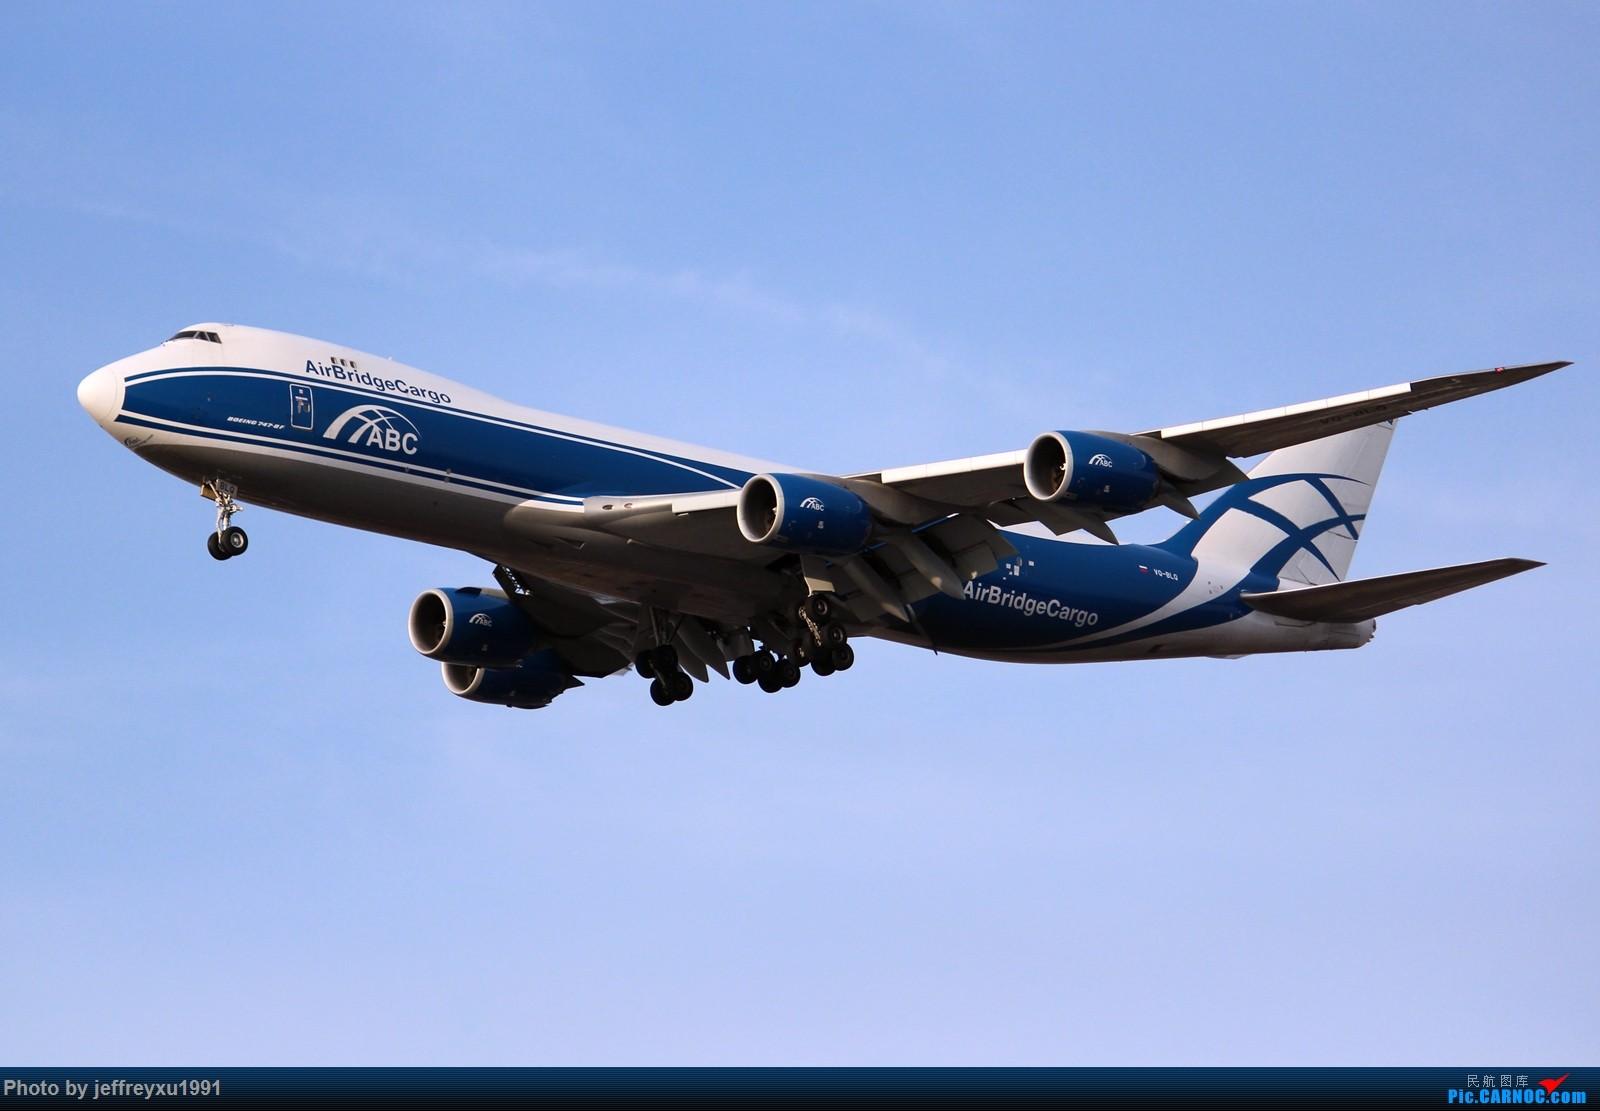 Re:【芝加哥拍机】果然烂天出好货 AirBridgeCargo空桥货运747-8 降落芝加哥奥海尔 BOEING 747-8F YQ-BLQ 美国芝加哥奥黑尔国际机场